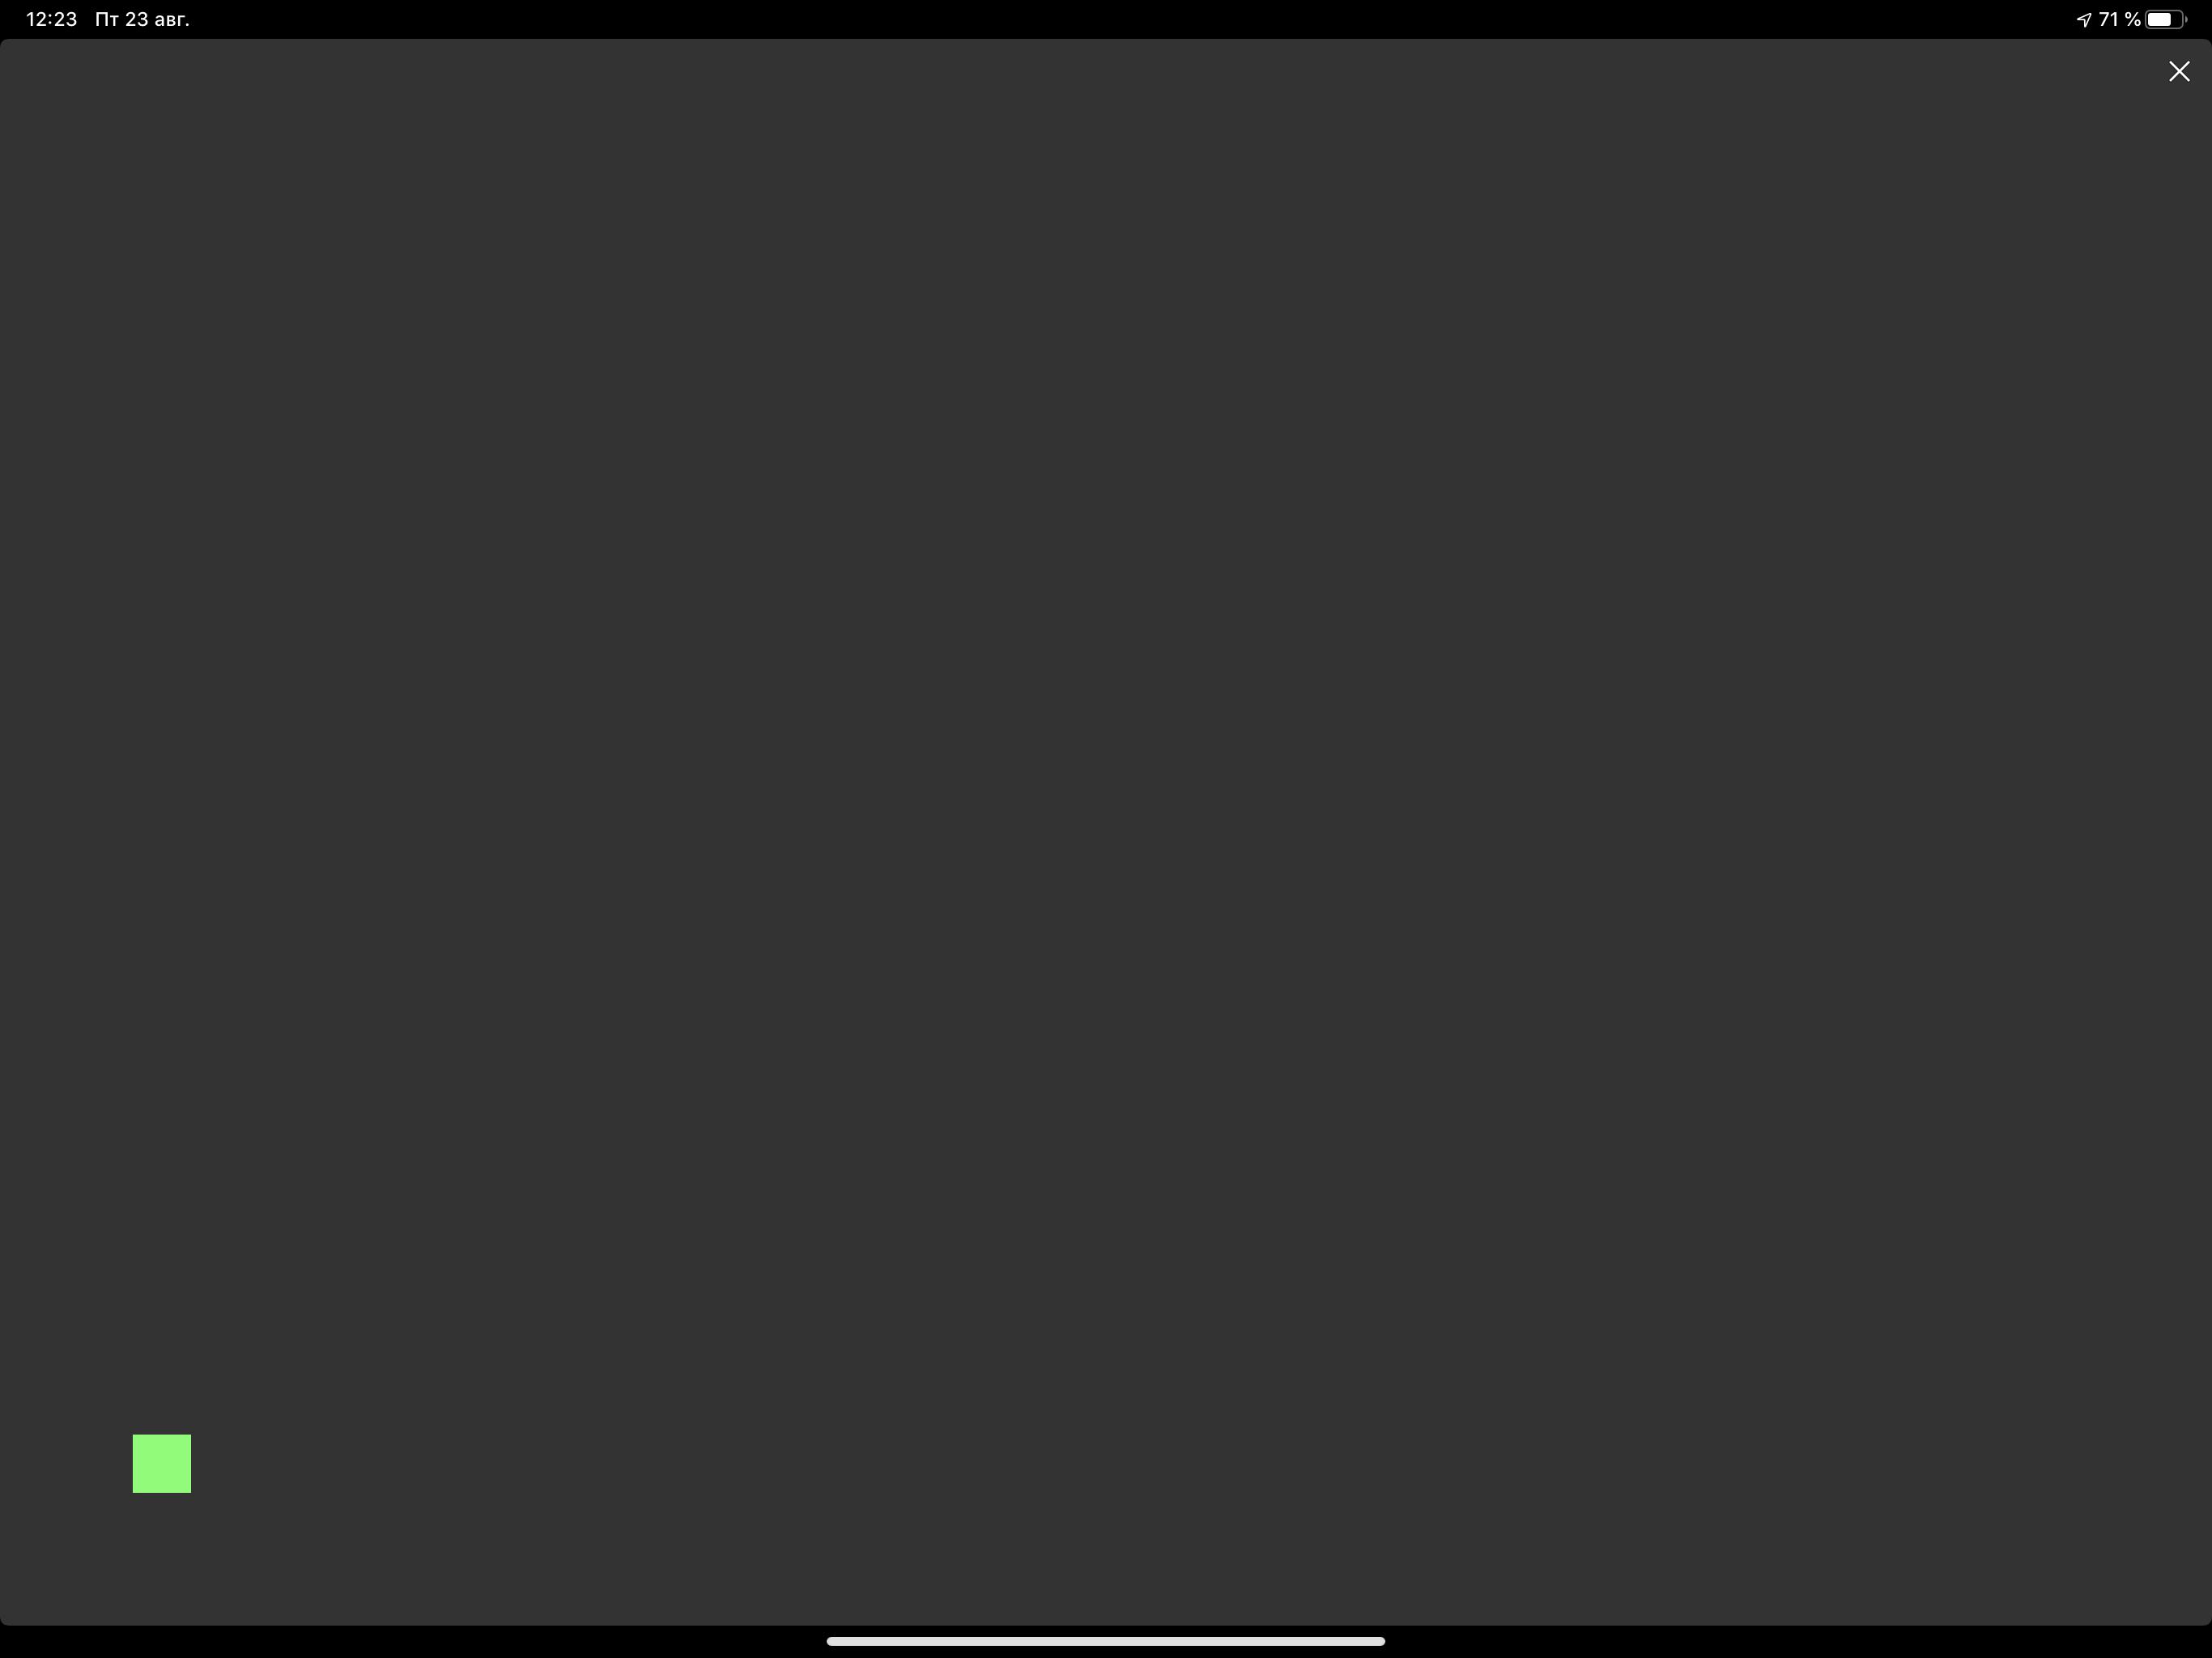 Написание змейки на ipad (pythonista) - 8